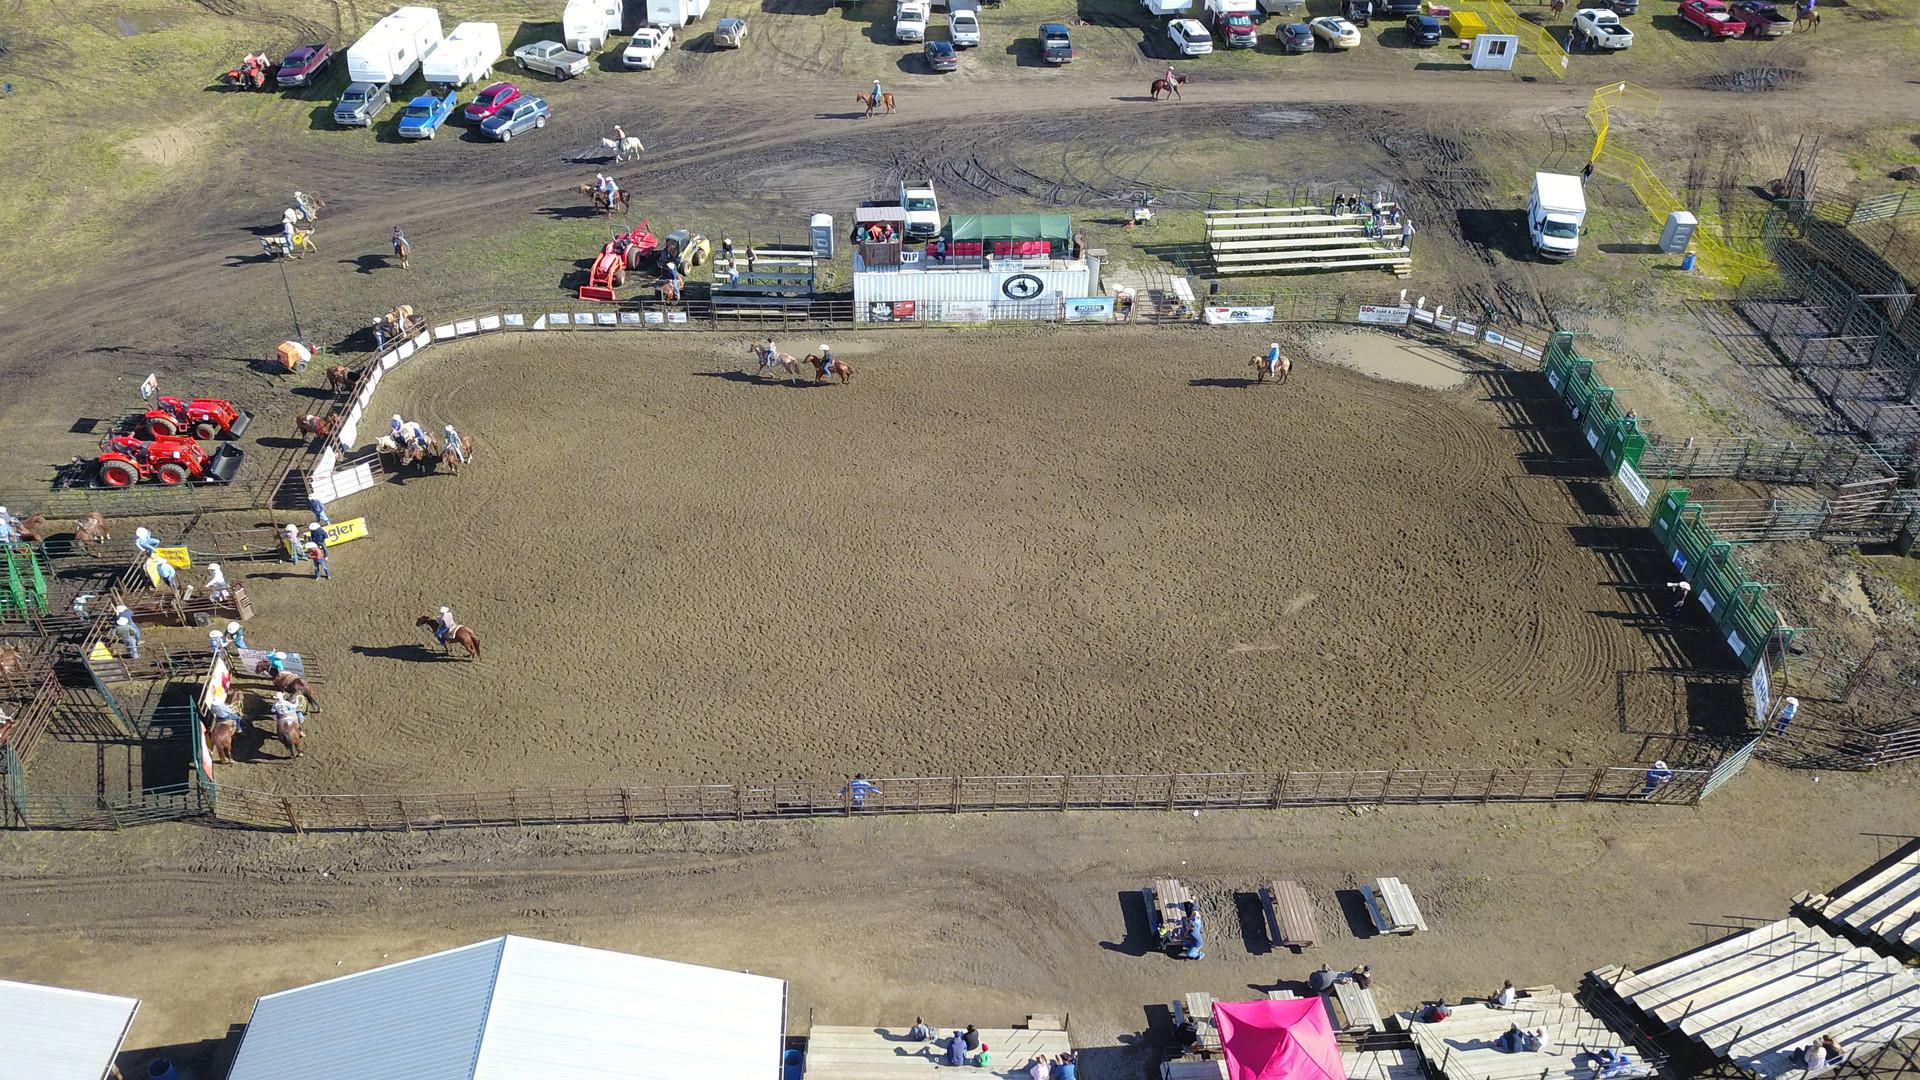 Rodeo arena